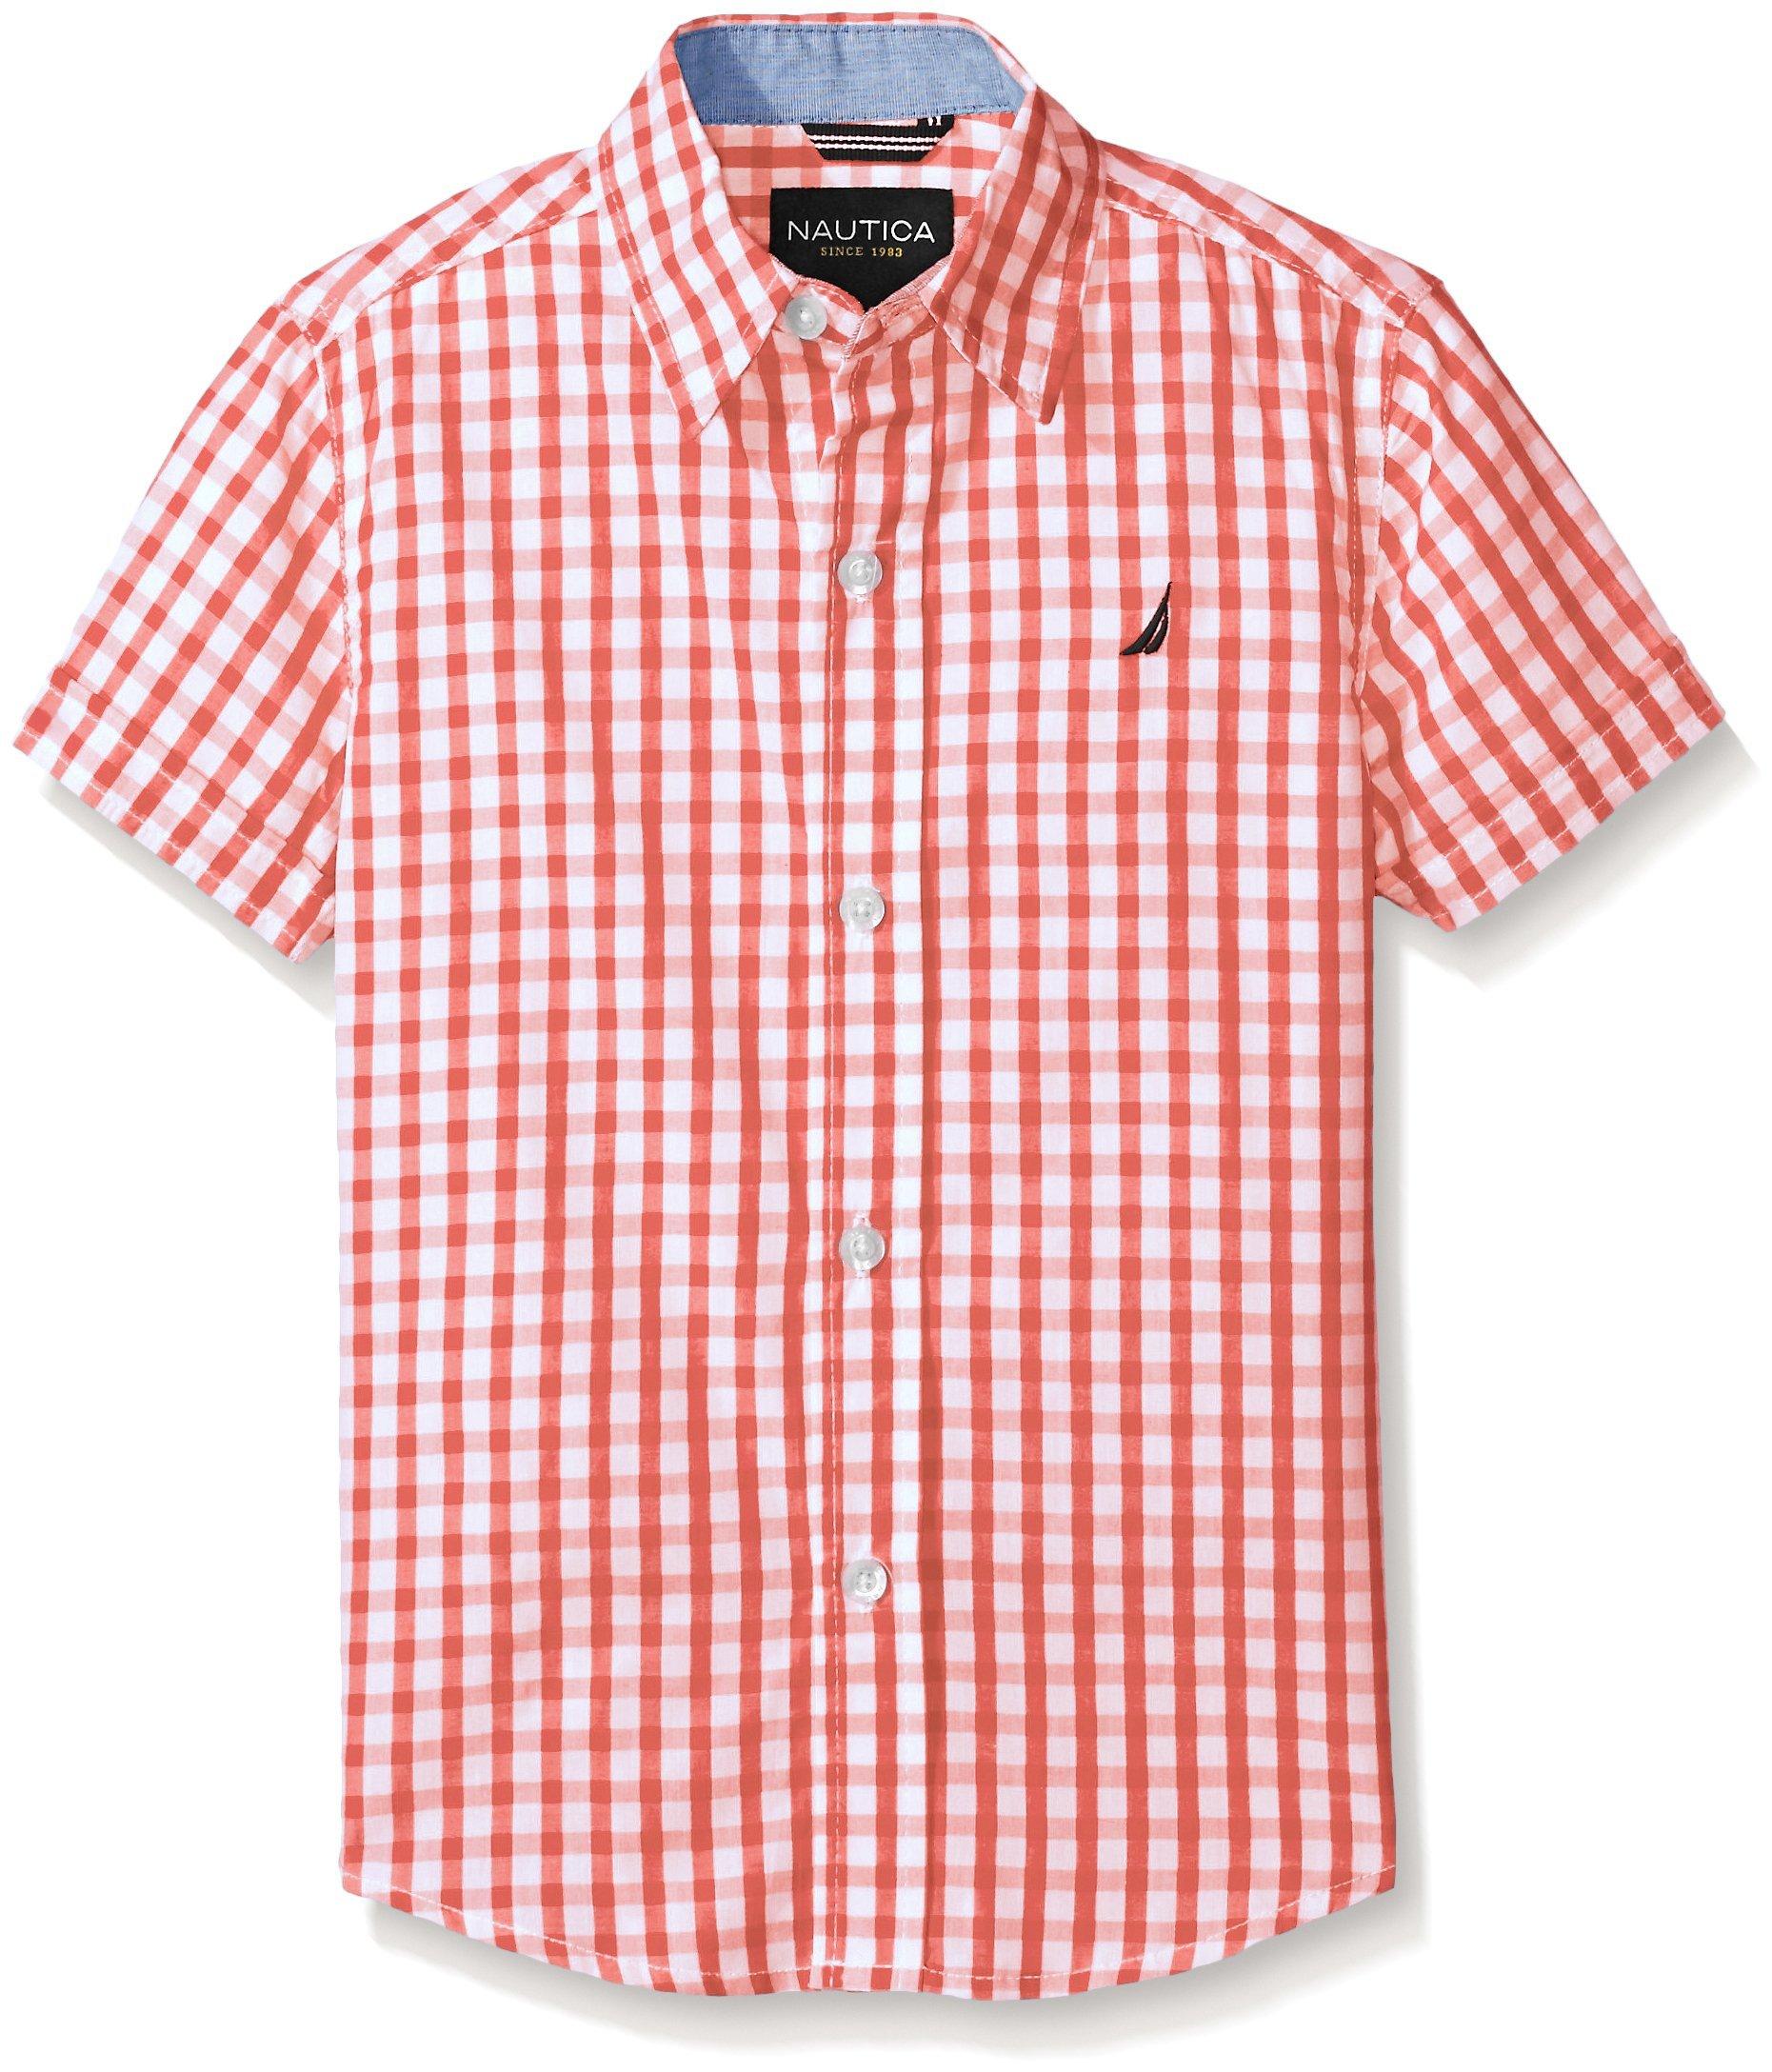 Cheap T Shirt Nautica Find T Shirt Nautica Deals On Line At Alibaba